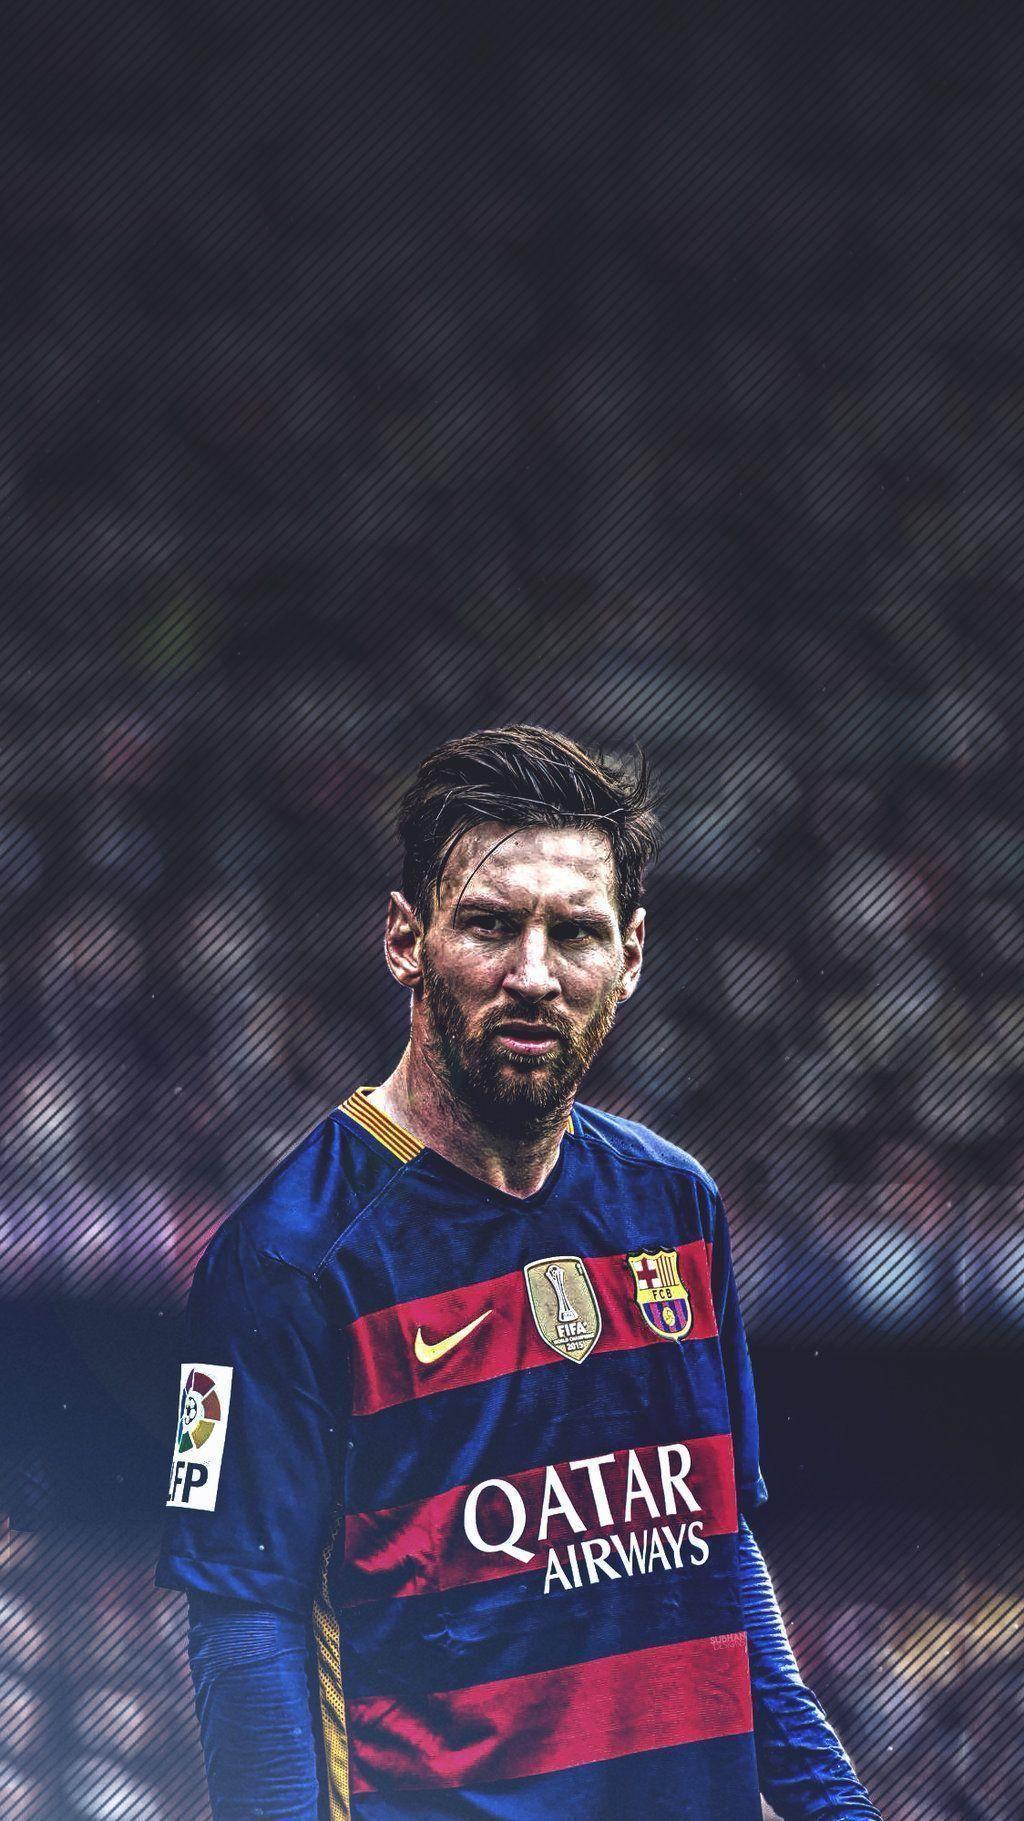 Lionel Messi 2017 Wallpapers Full Hd Desktop Wallpaper